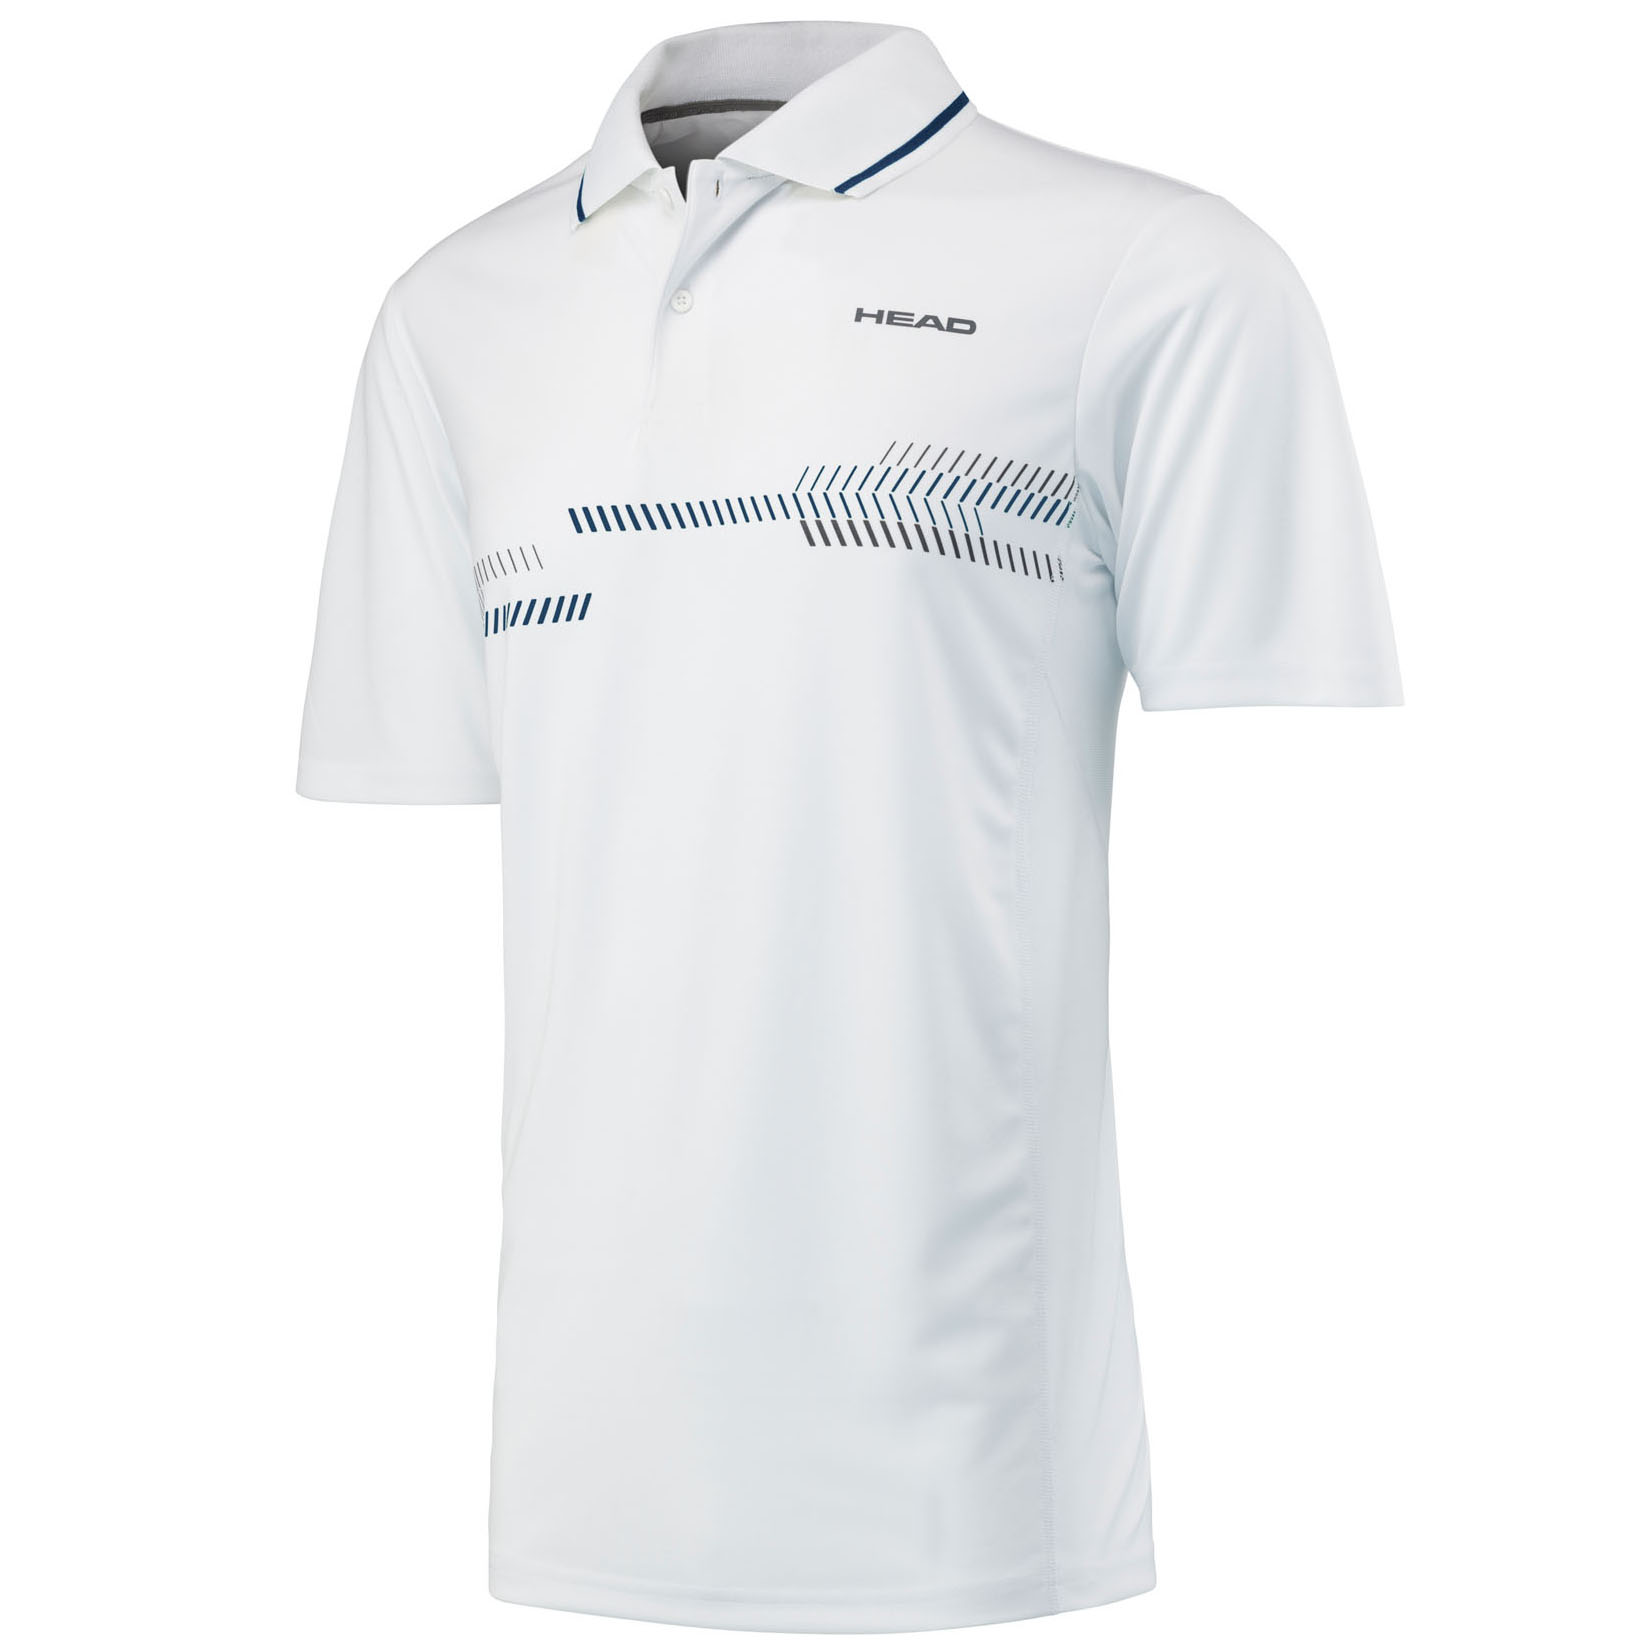 Head Club Technical Boys Polo Shirt - White/Navy, S